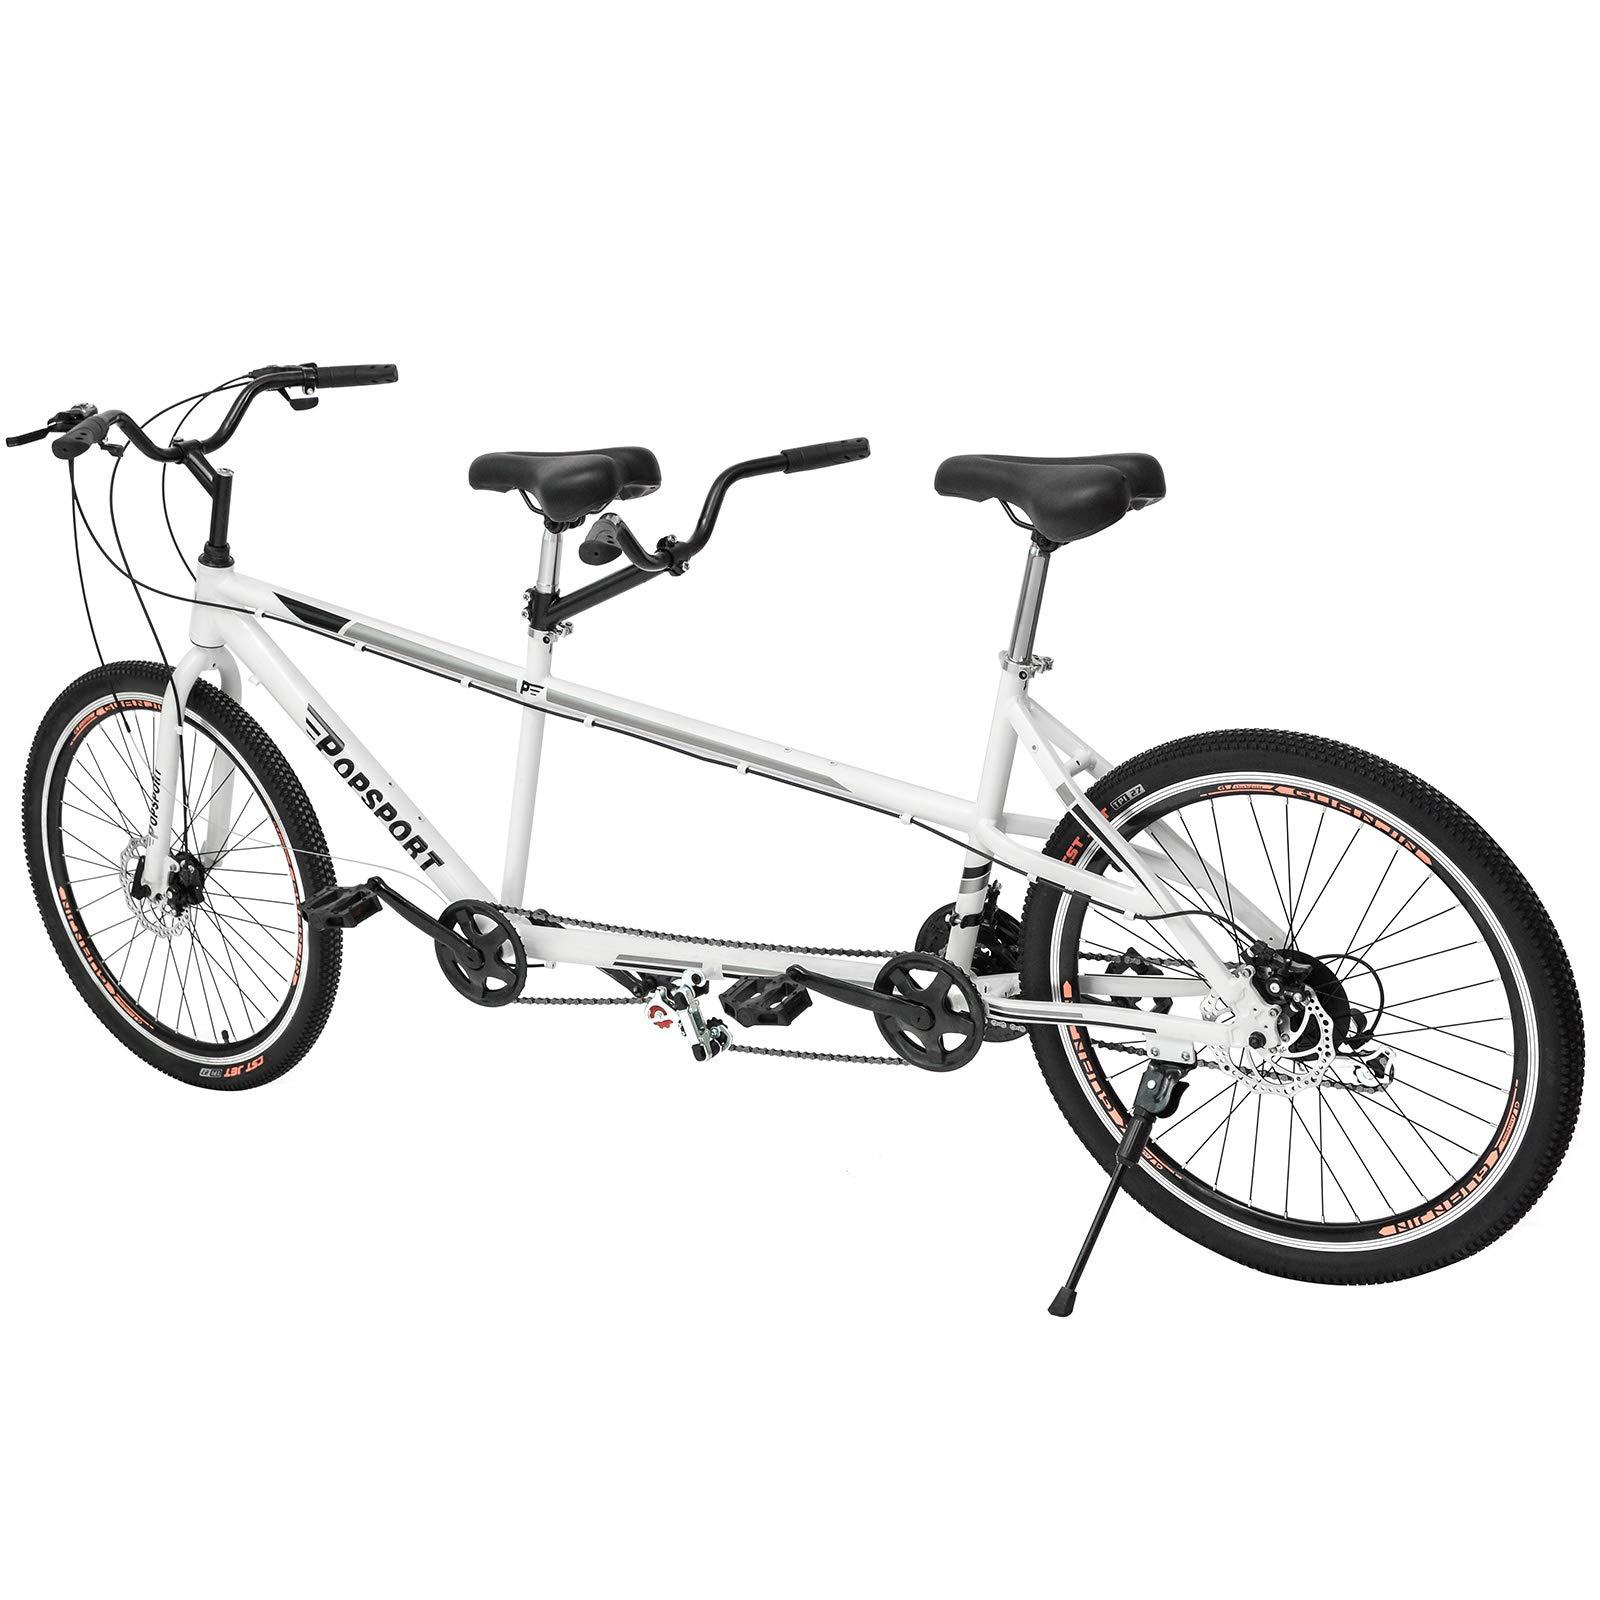 Mophorn Dual Drive Tandem Bike 26 Inch Wheel Aluminium Alloy Twinn Tandem Bicycle 7 Mechanical Disc Brakes (Grey) by Mophorn